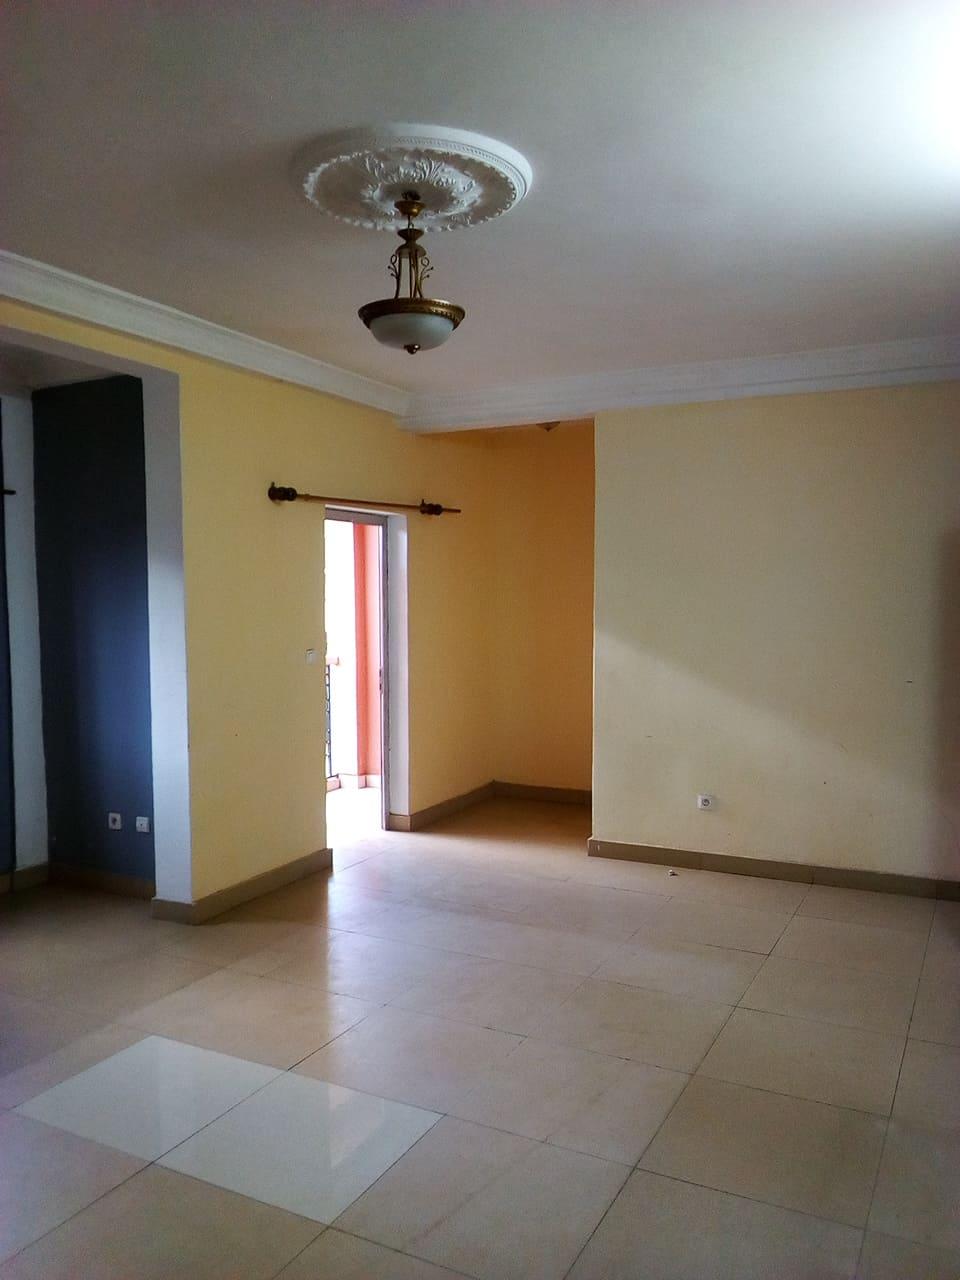 Apartment to rent - Yaoundé, Mballa II, pas loin DE REGI - 1 living room(s), 2 bedroom(s), 2 bathroom(s) - 180 000 FCFA / month